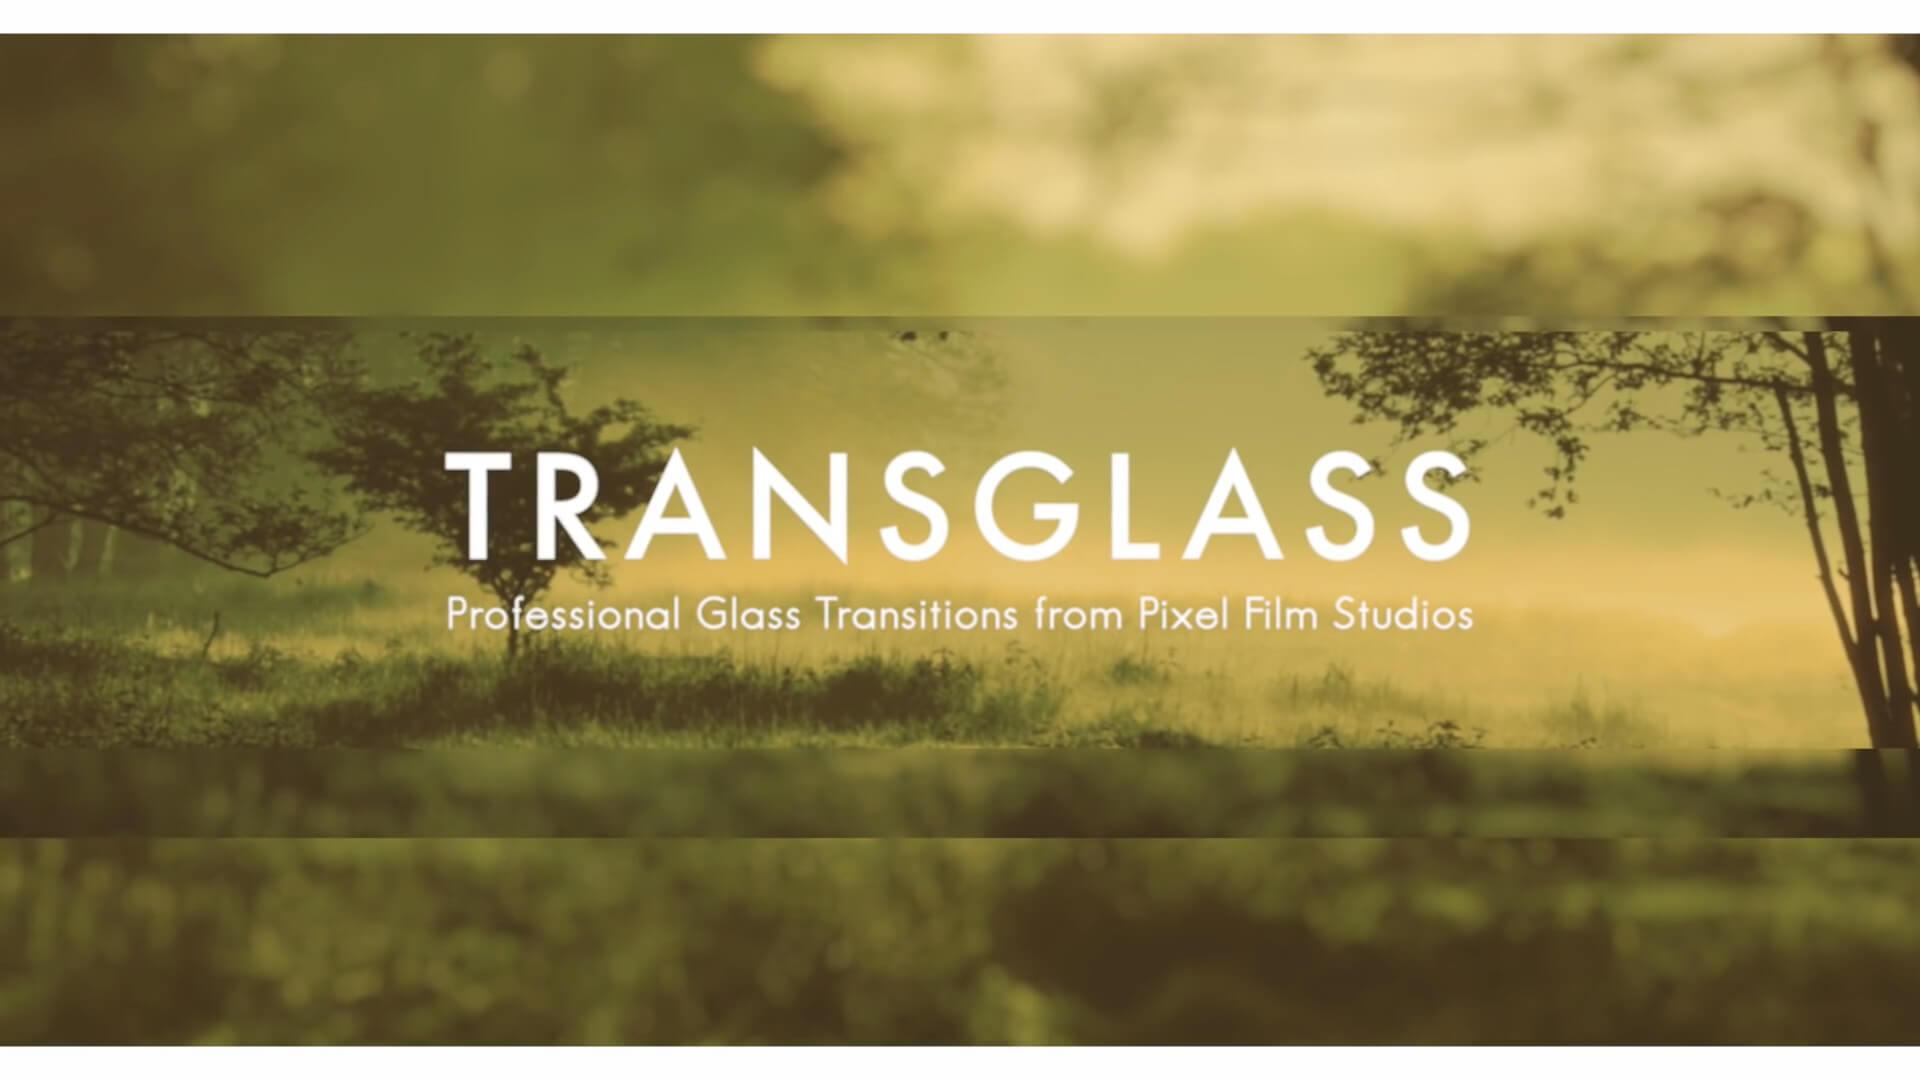 fcpx转场插件 简约时尚磨砂玻璃质感风格转场 TransGlass